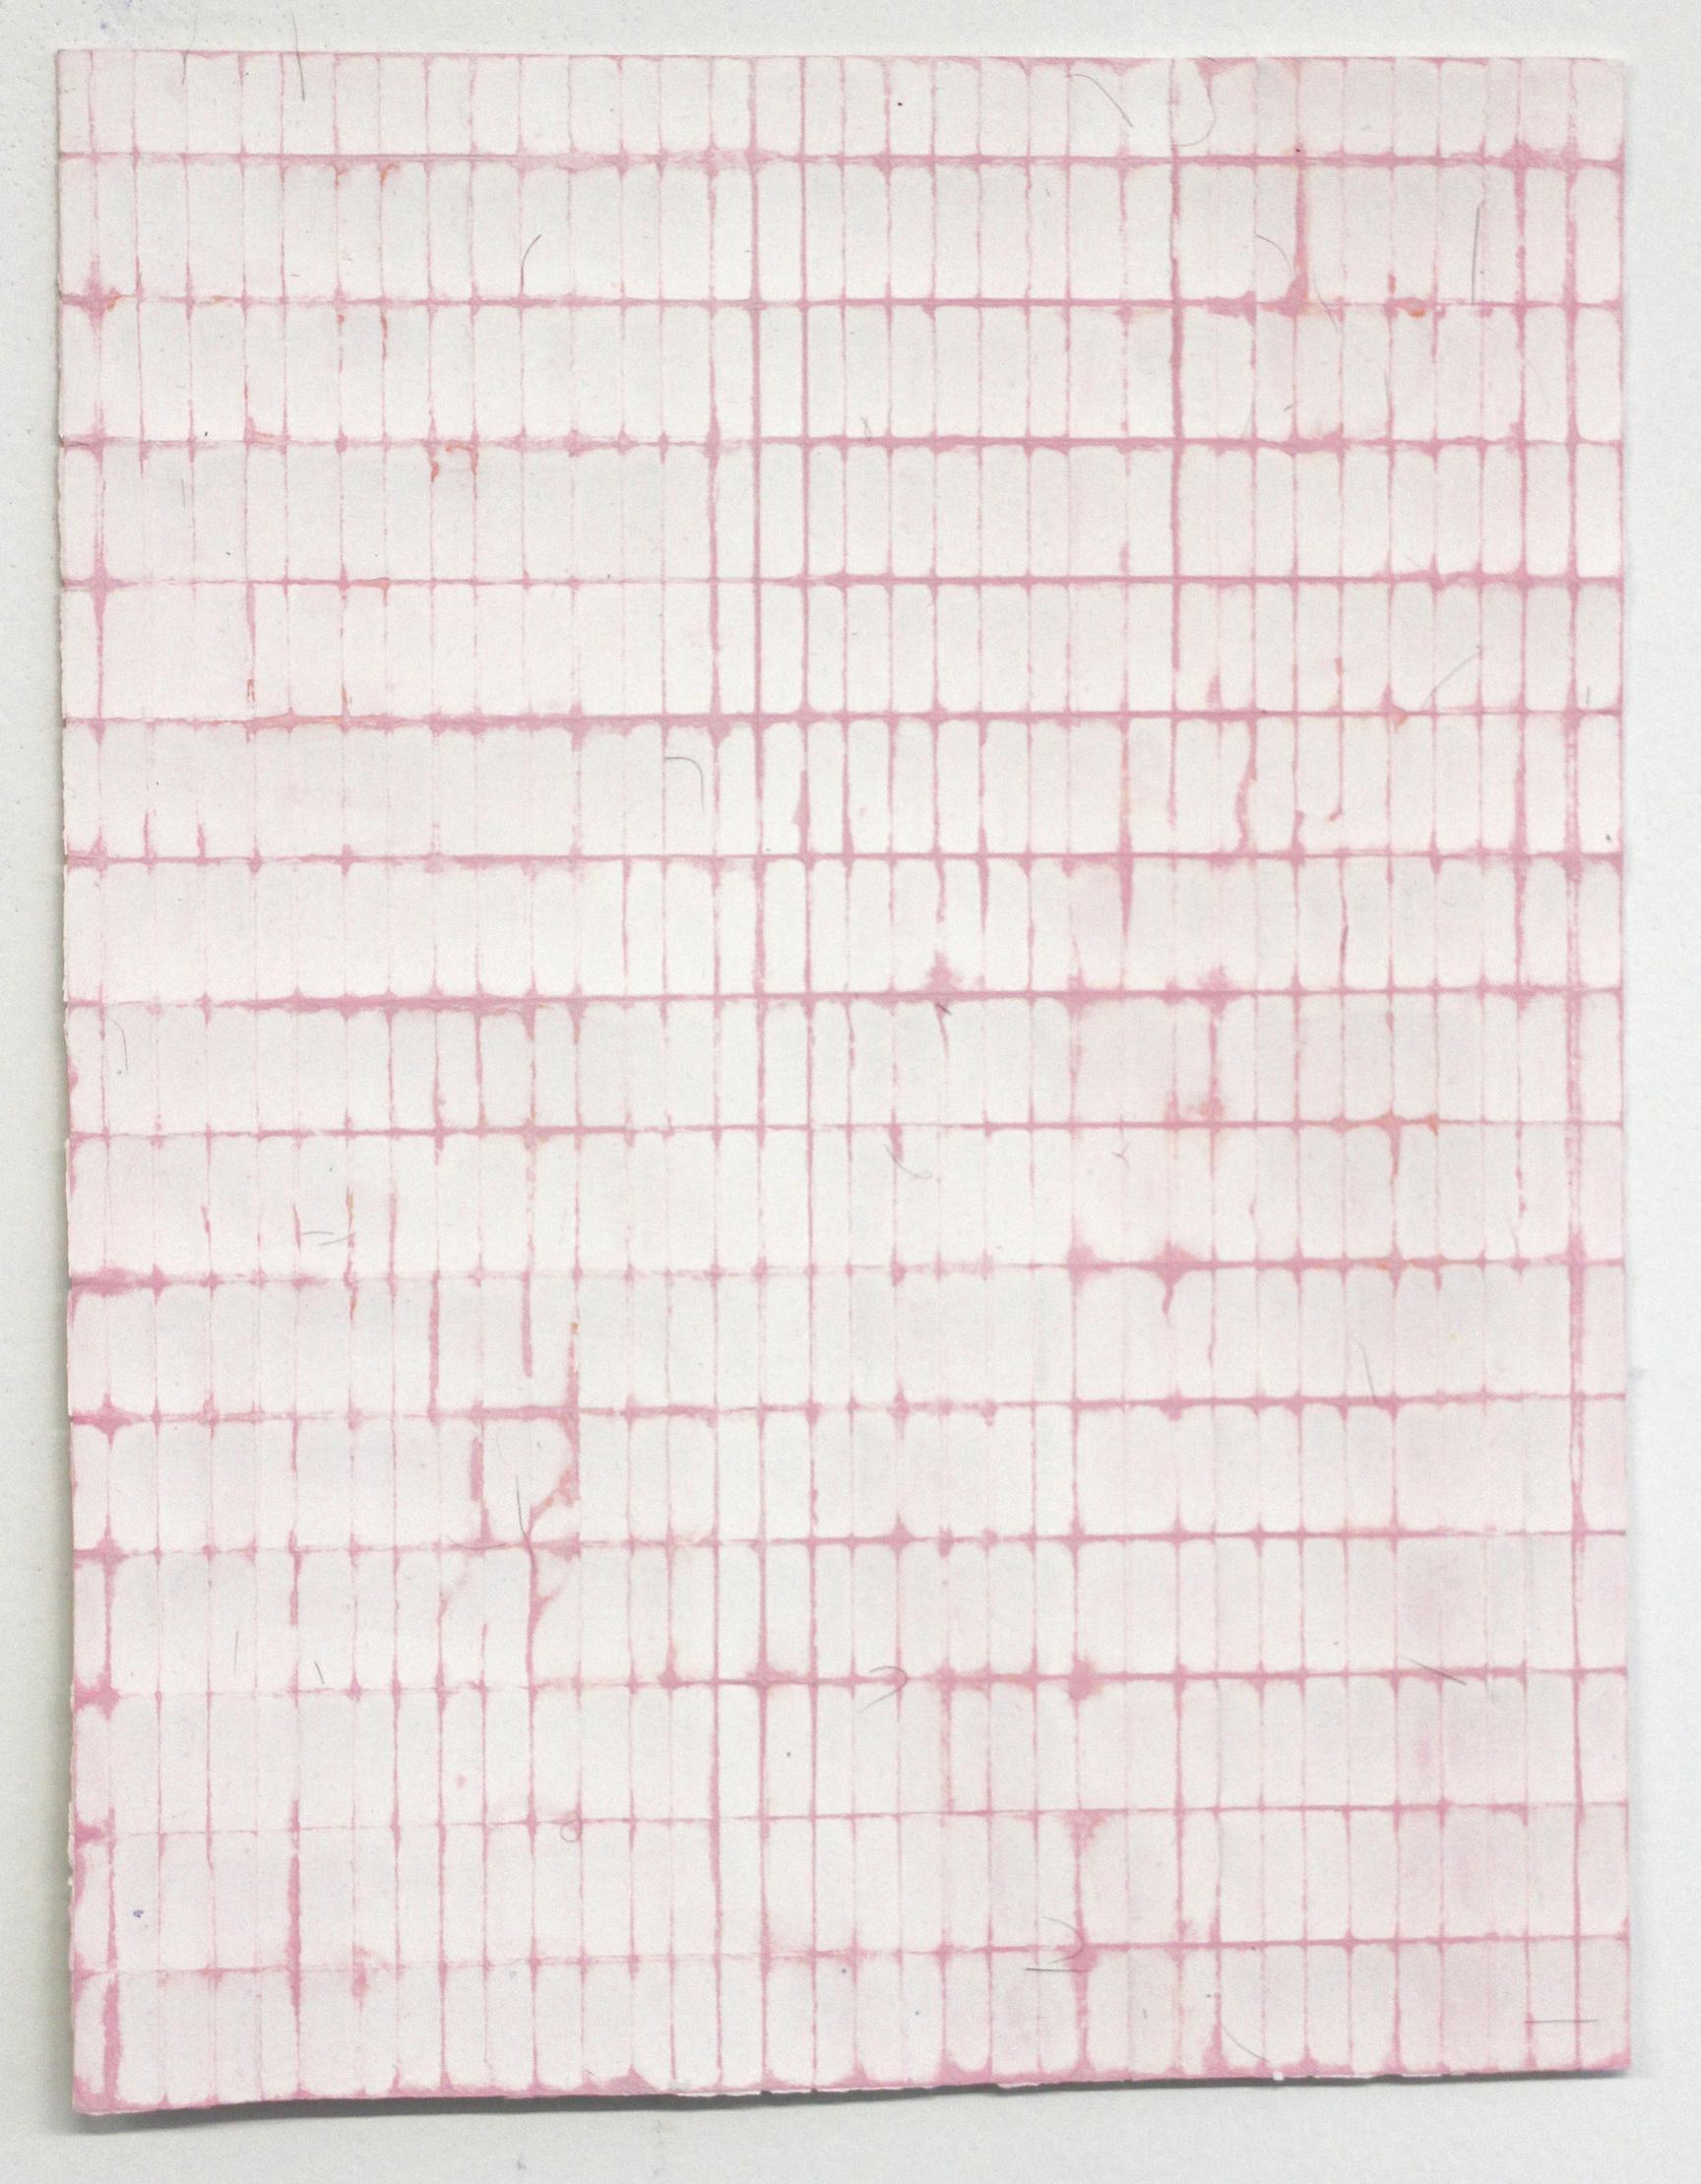 White/Pink 1x1.4 5.1.19